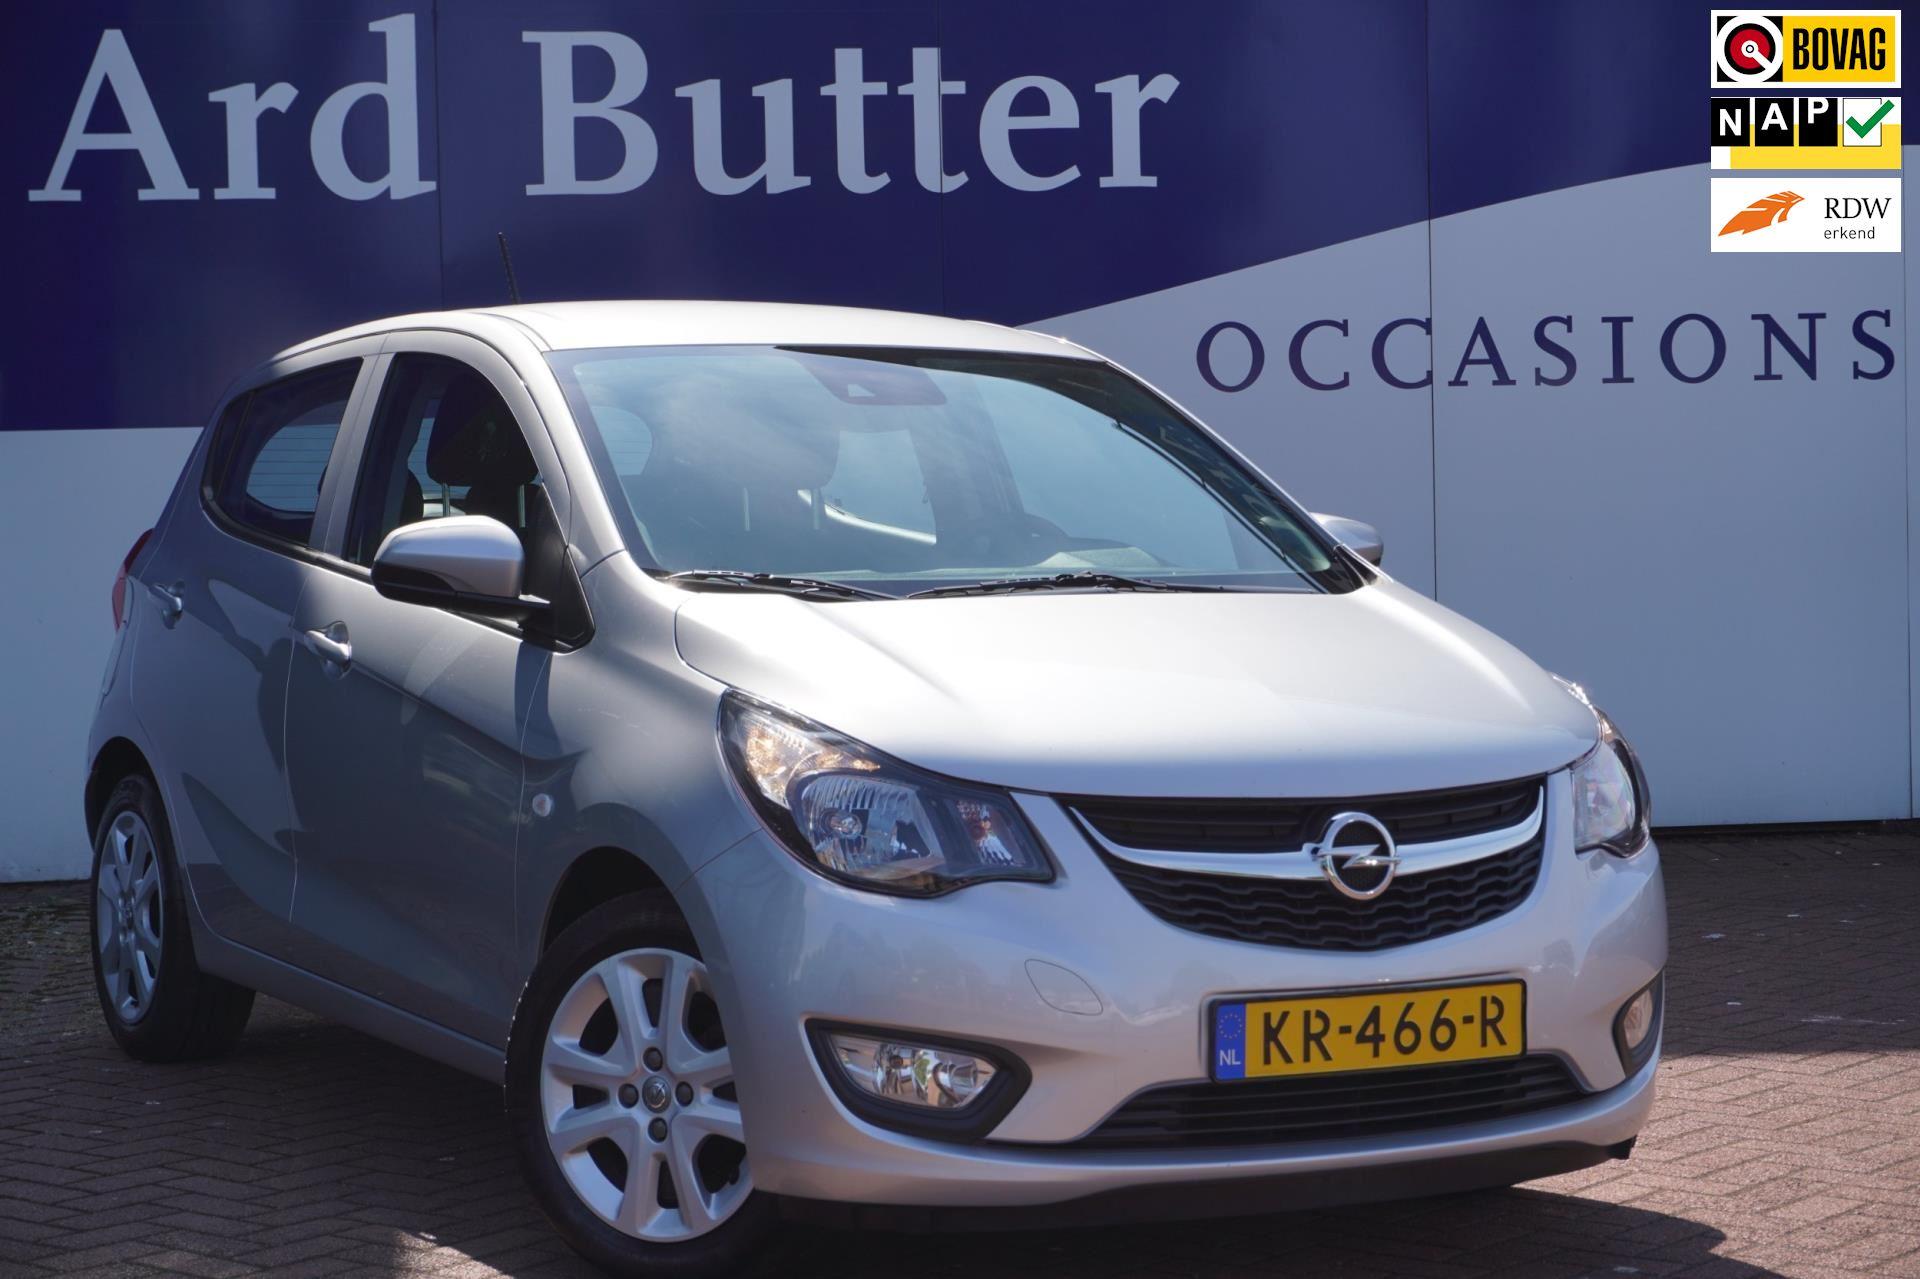 Opel KARL occasion - Autobedrijf Ard Butter B.V.